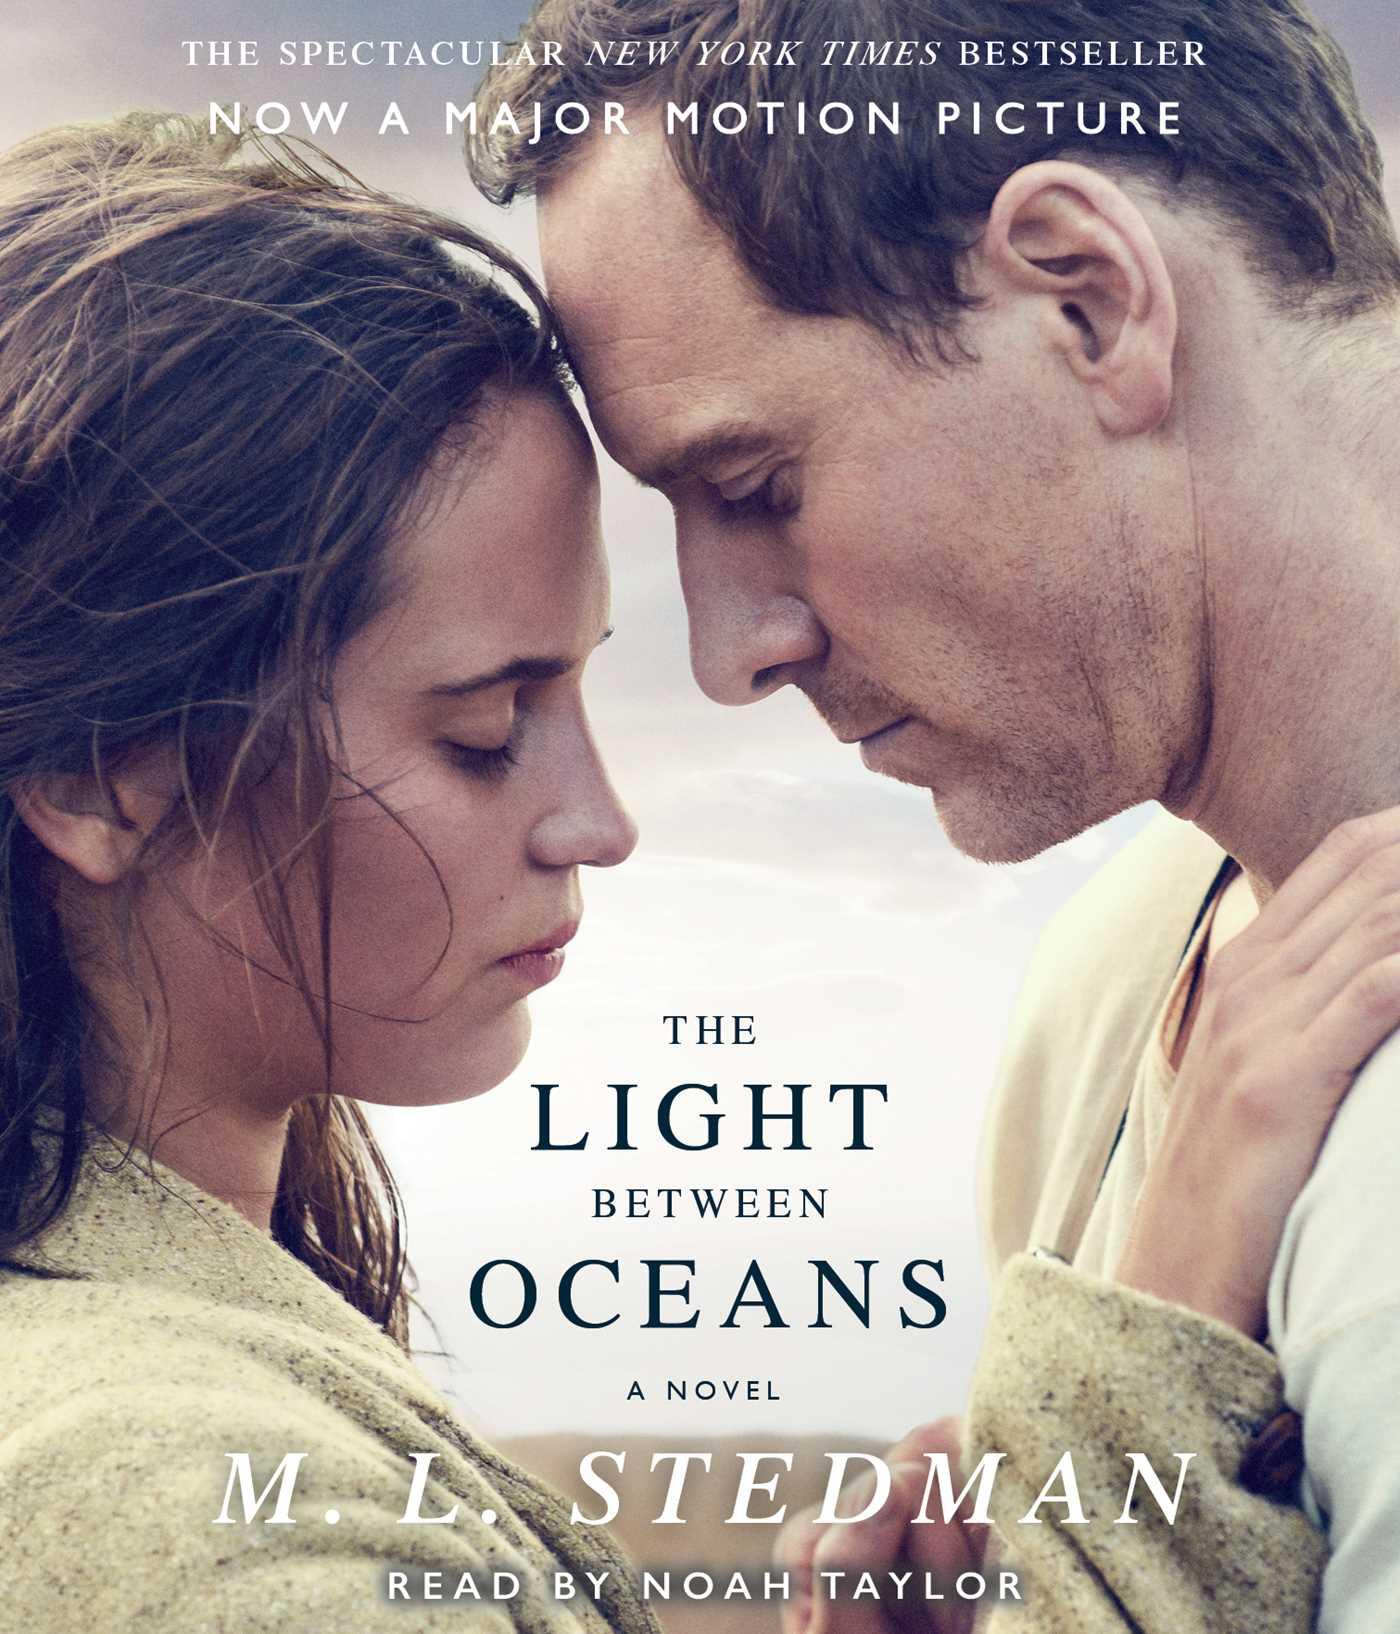 The light between oceans 9781442396166 hr